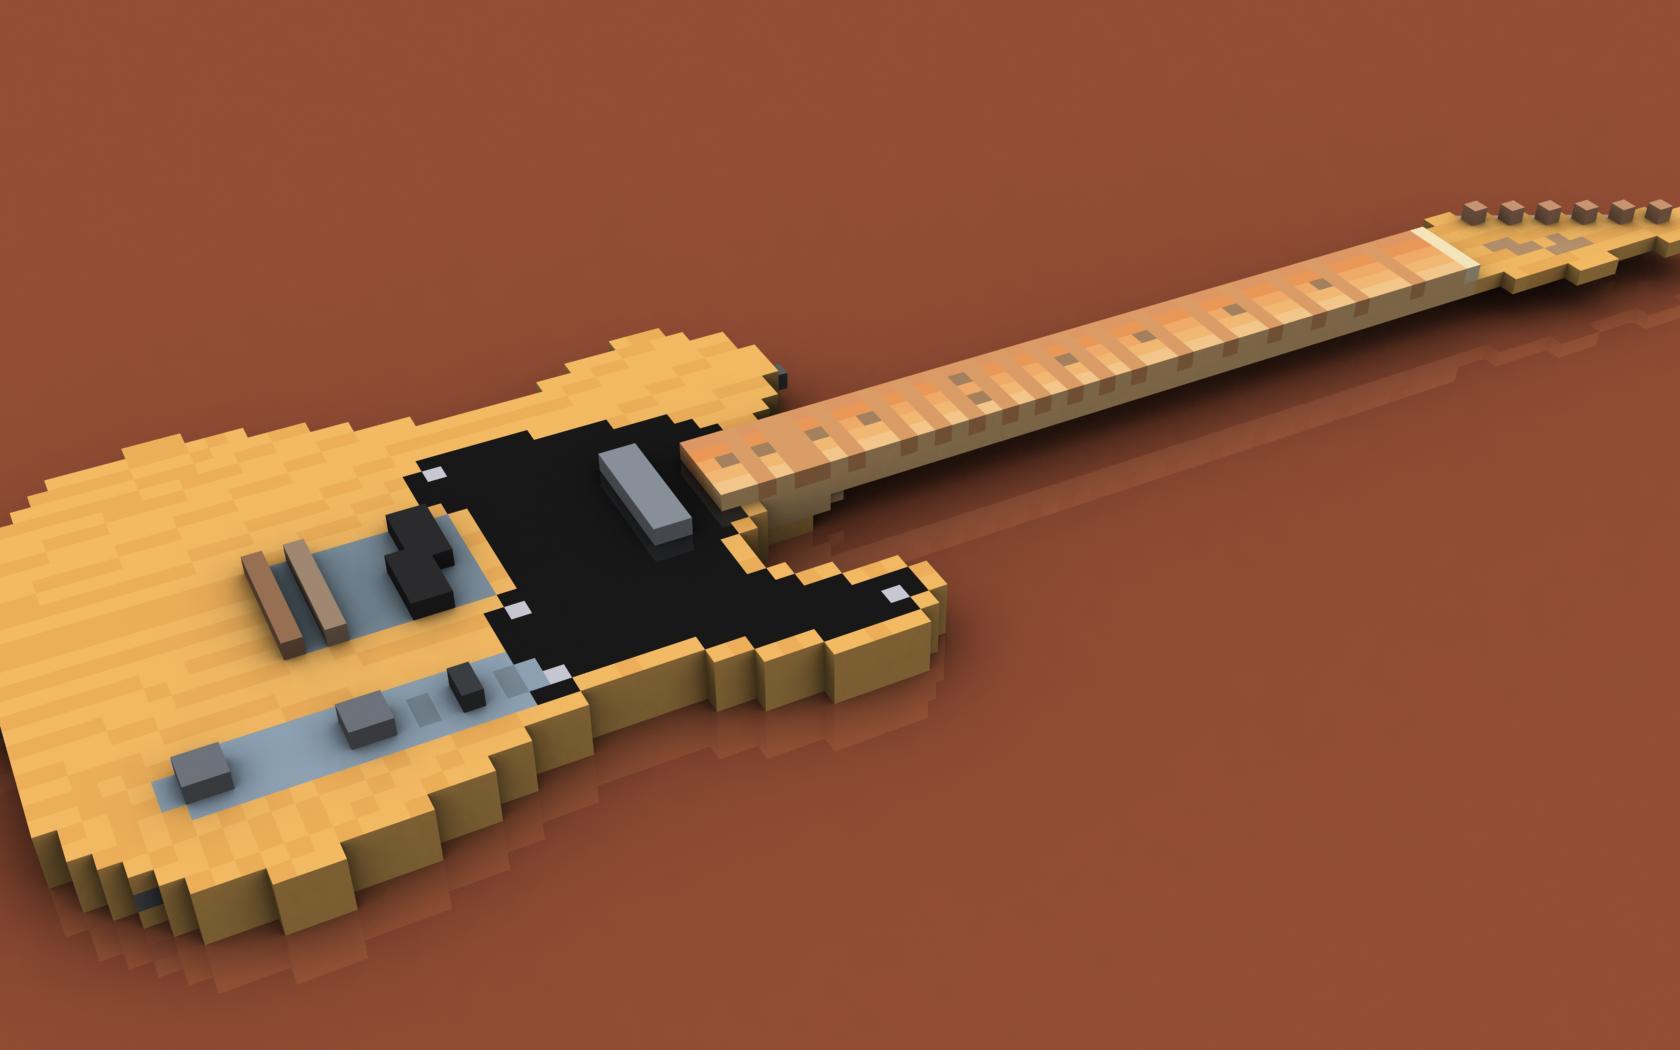 Fender Telecaster Wallpapers 1680x1050